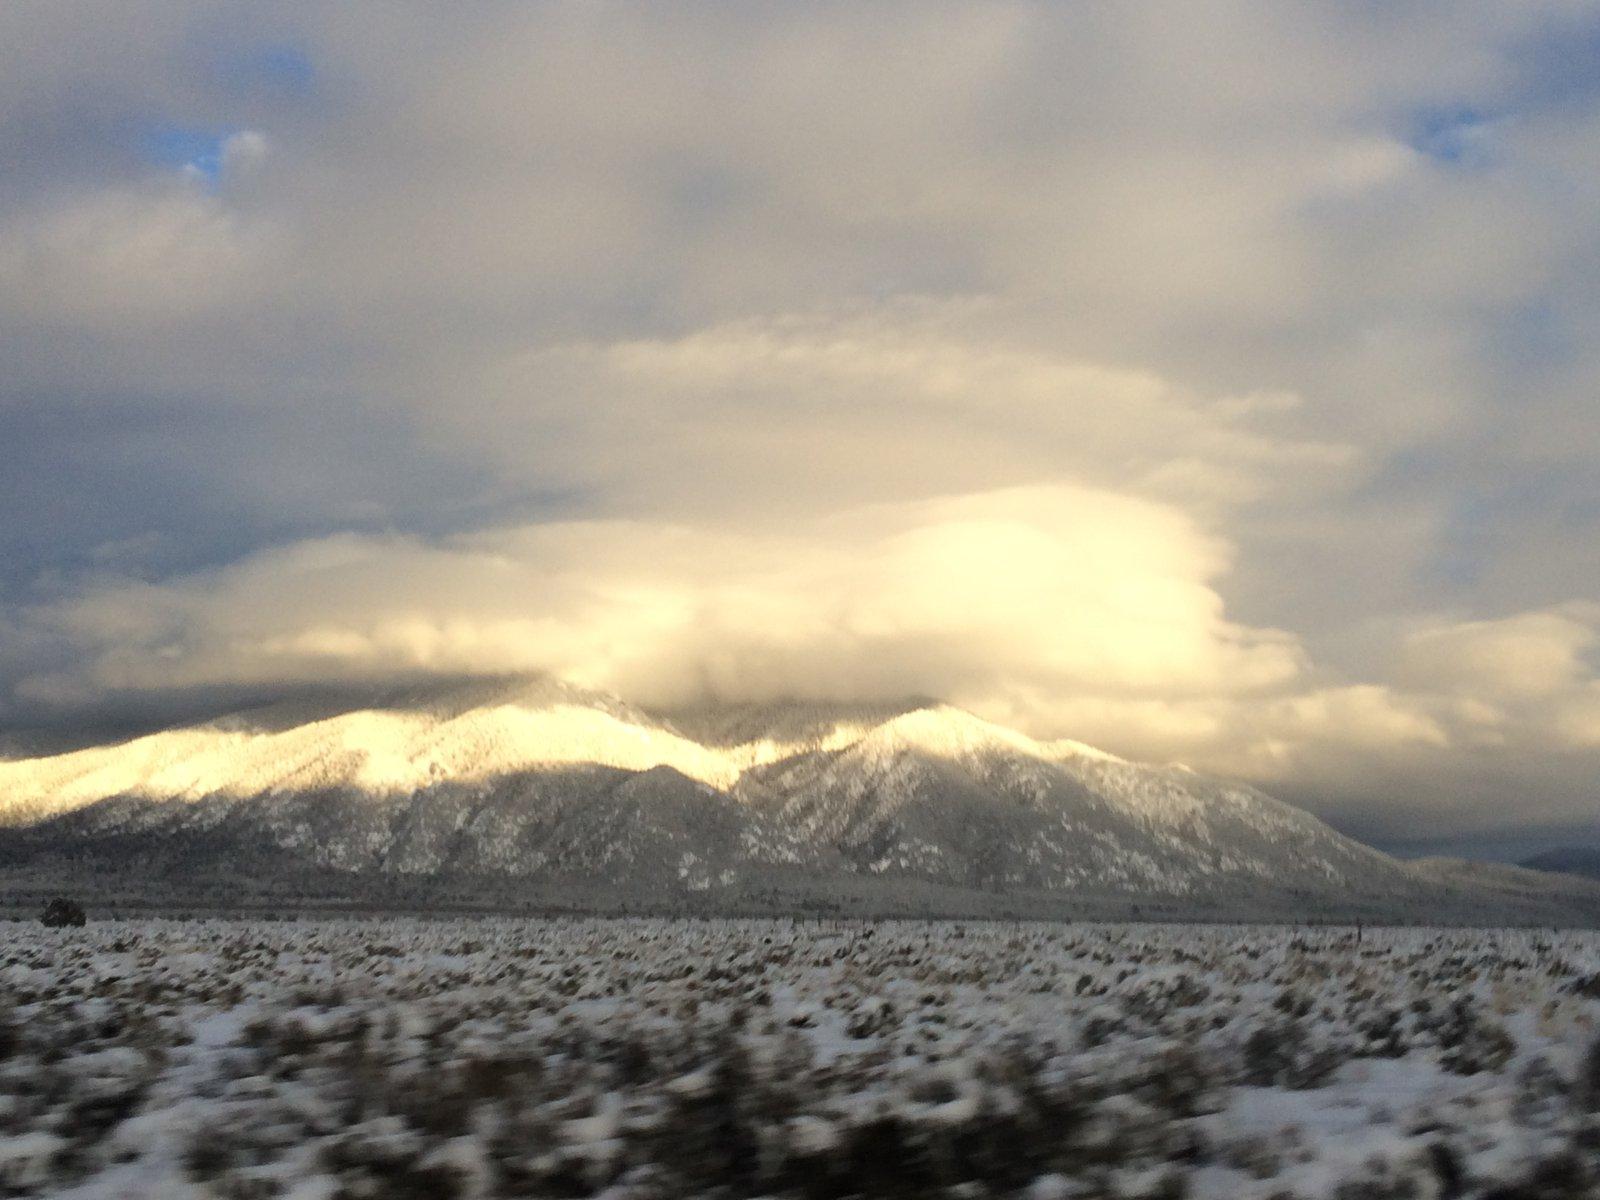 Taos Mountain going home